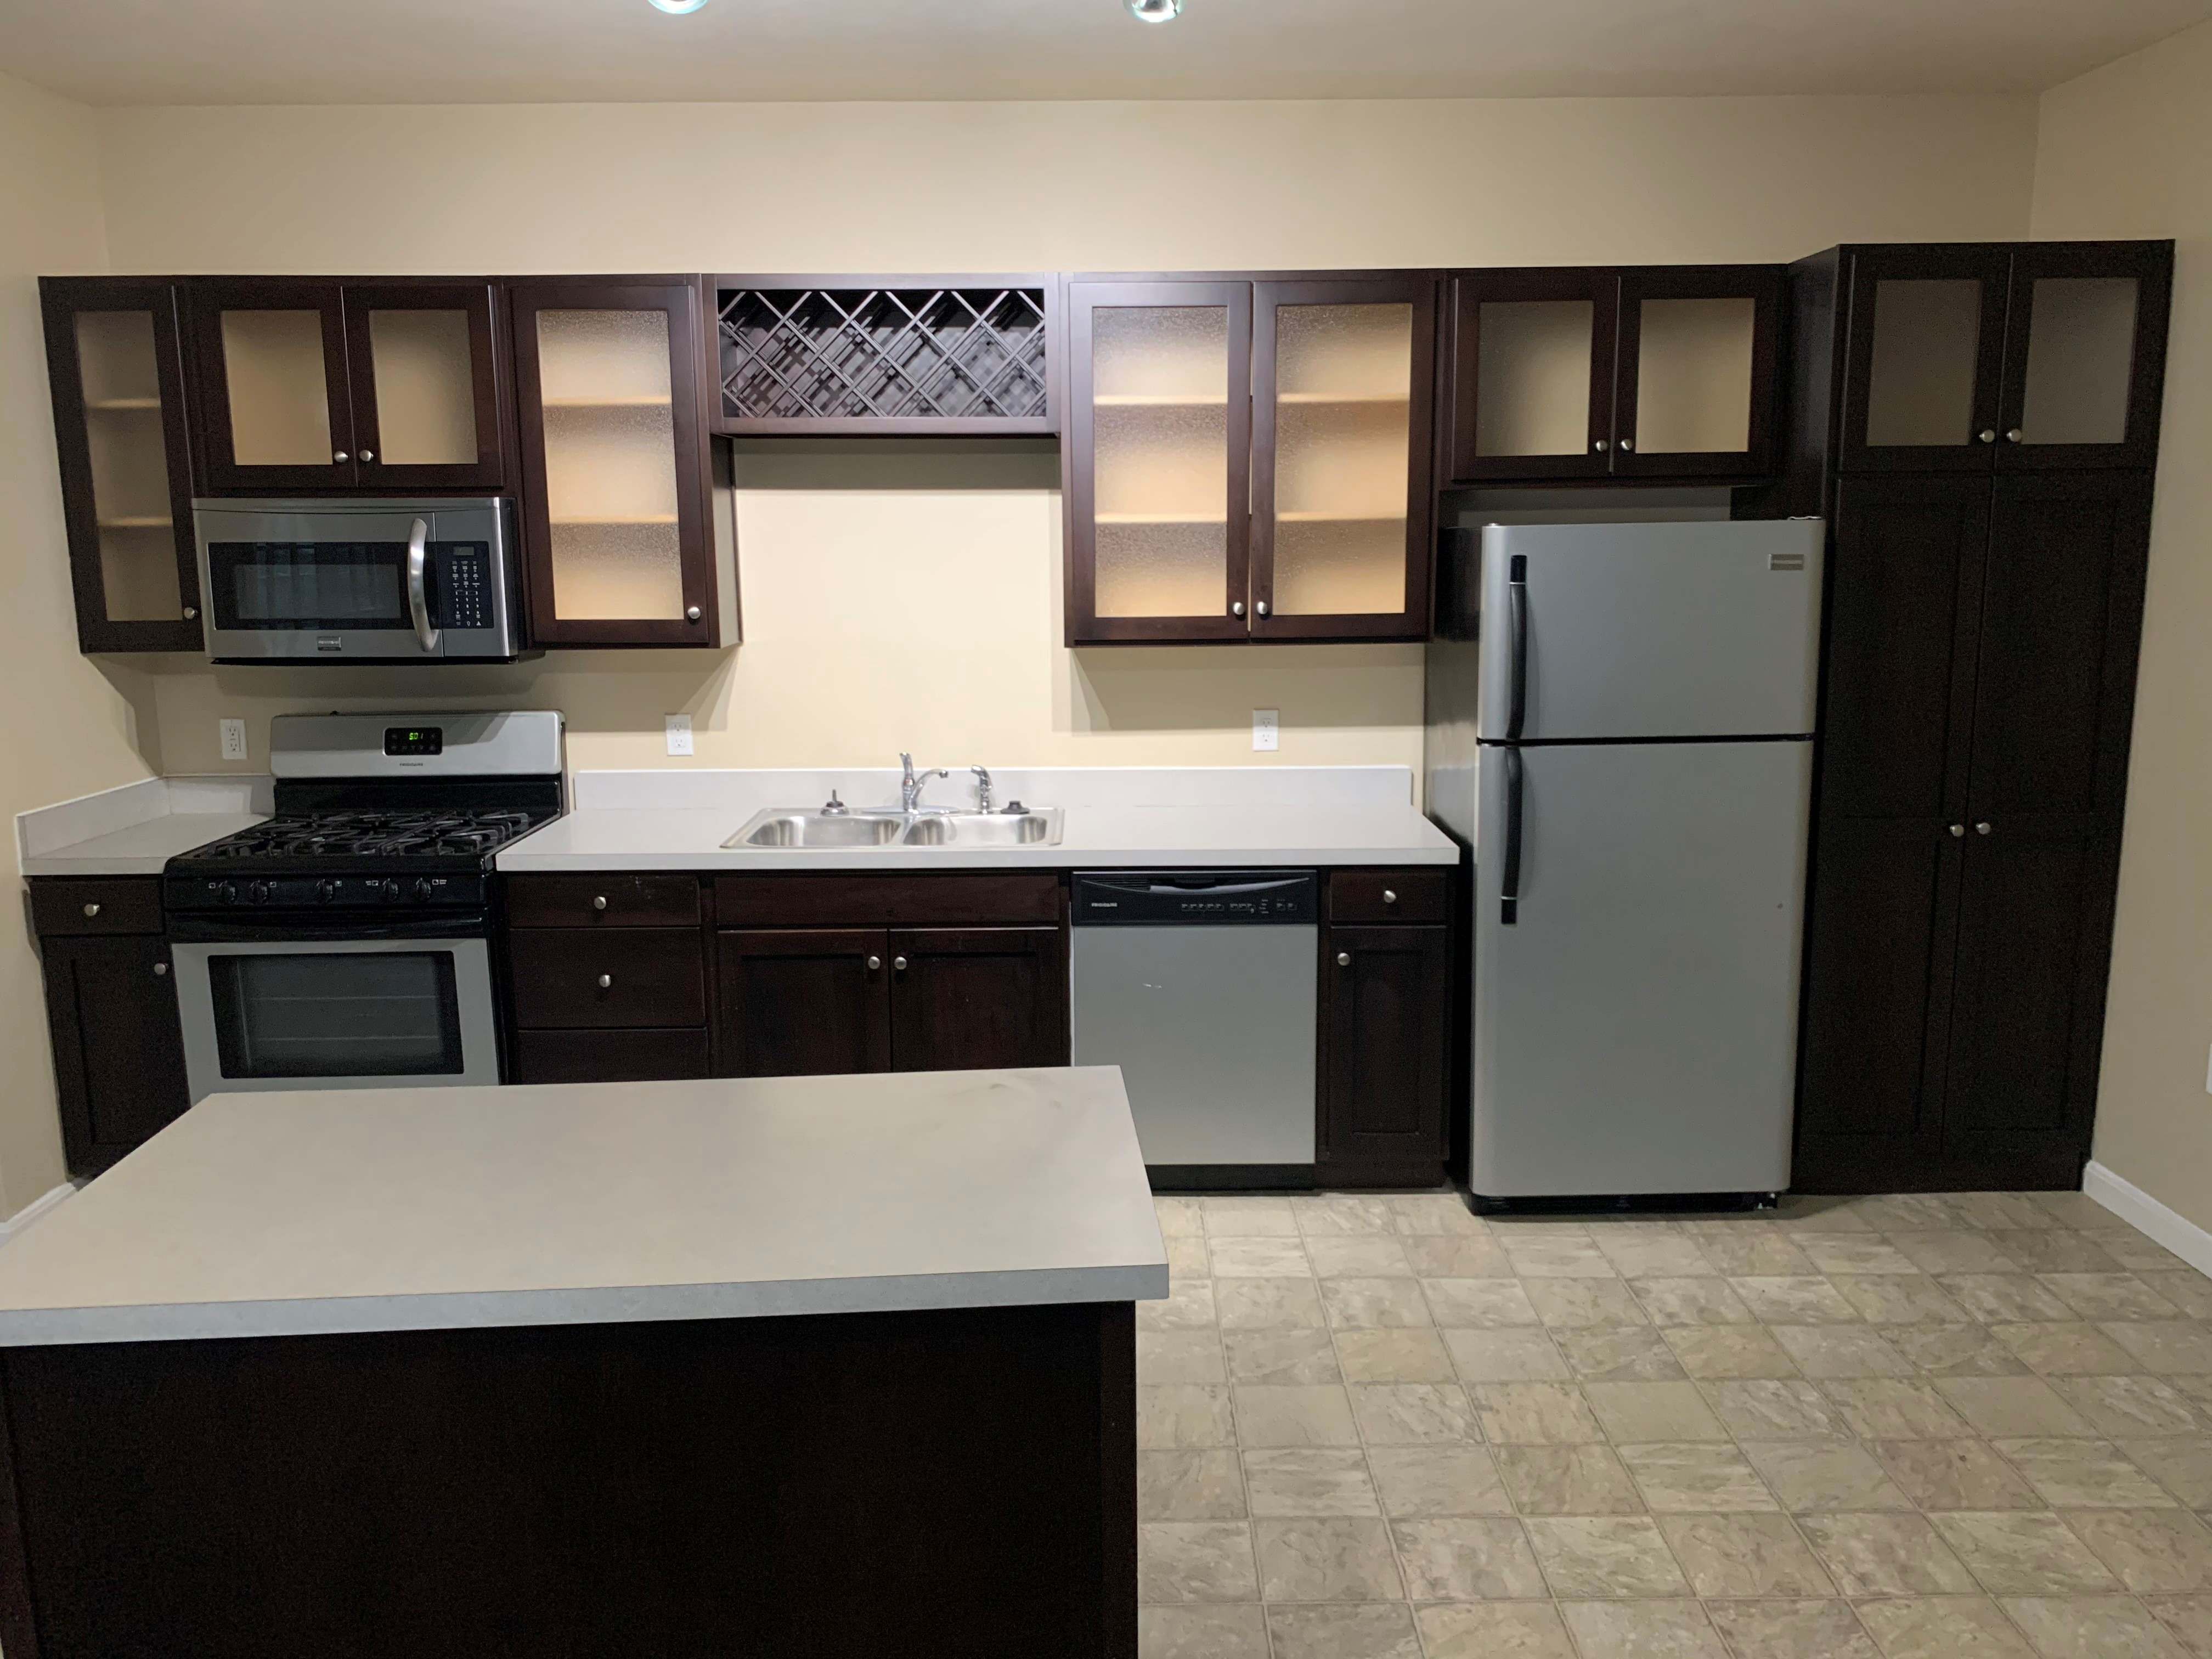 Pine Valley 1 Floor Apartment - 1 Bed, 1 Bath, 881sq ft ...